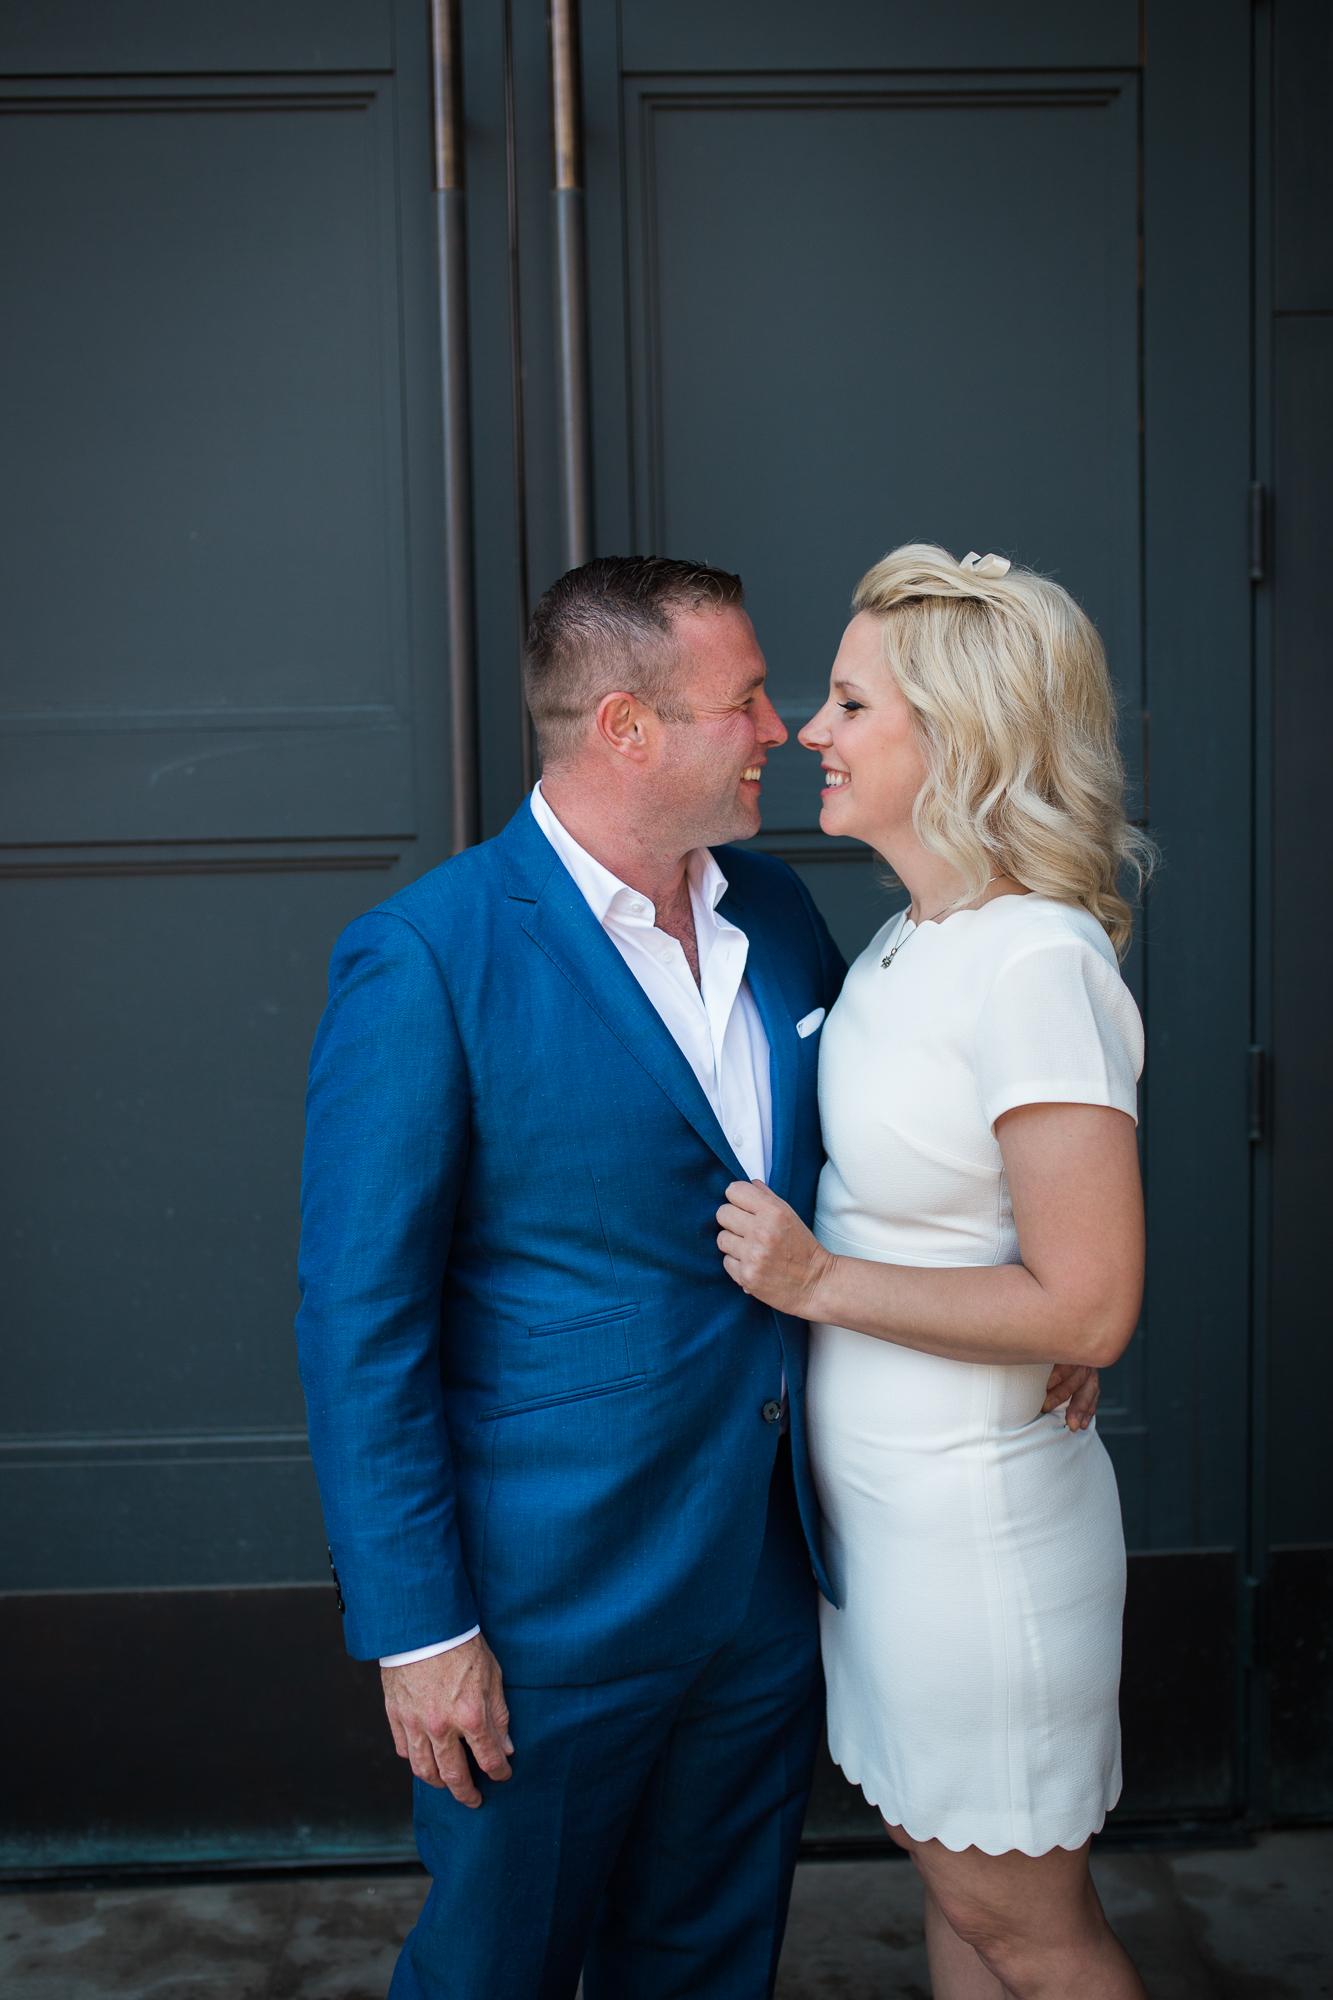 Calgary-wedding-photographer-CG-1.jpg